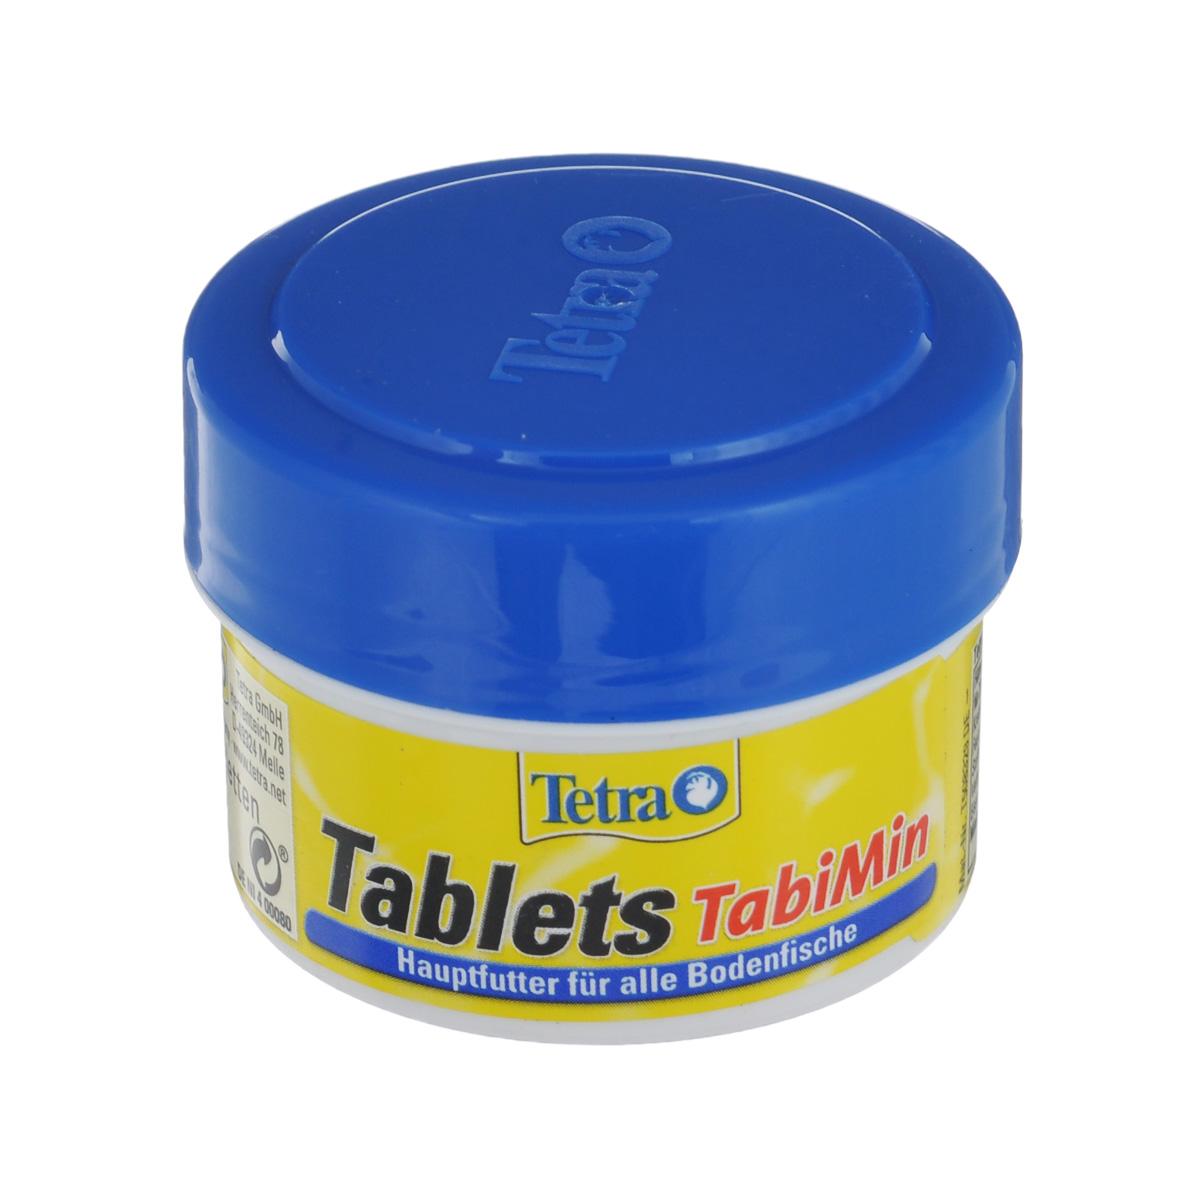 Корм сухой Tetra Tablets TabiMin, для всех видов донных рыб, 58 таблеток tetra tabimin